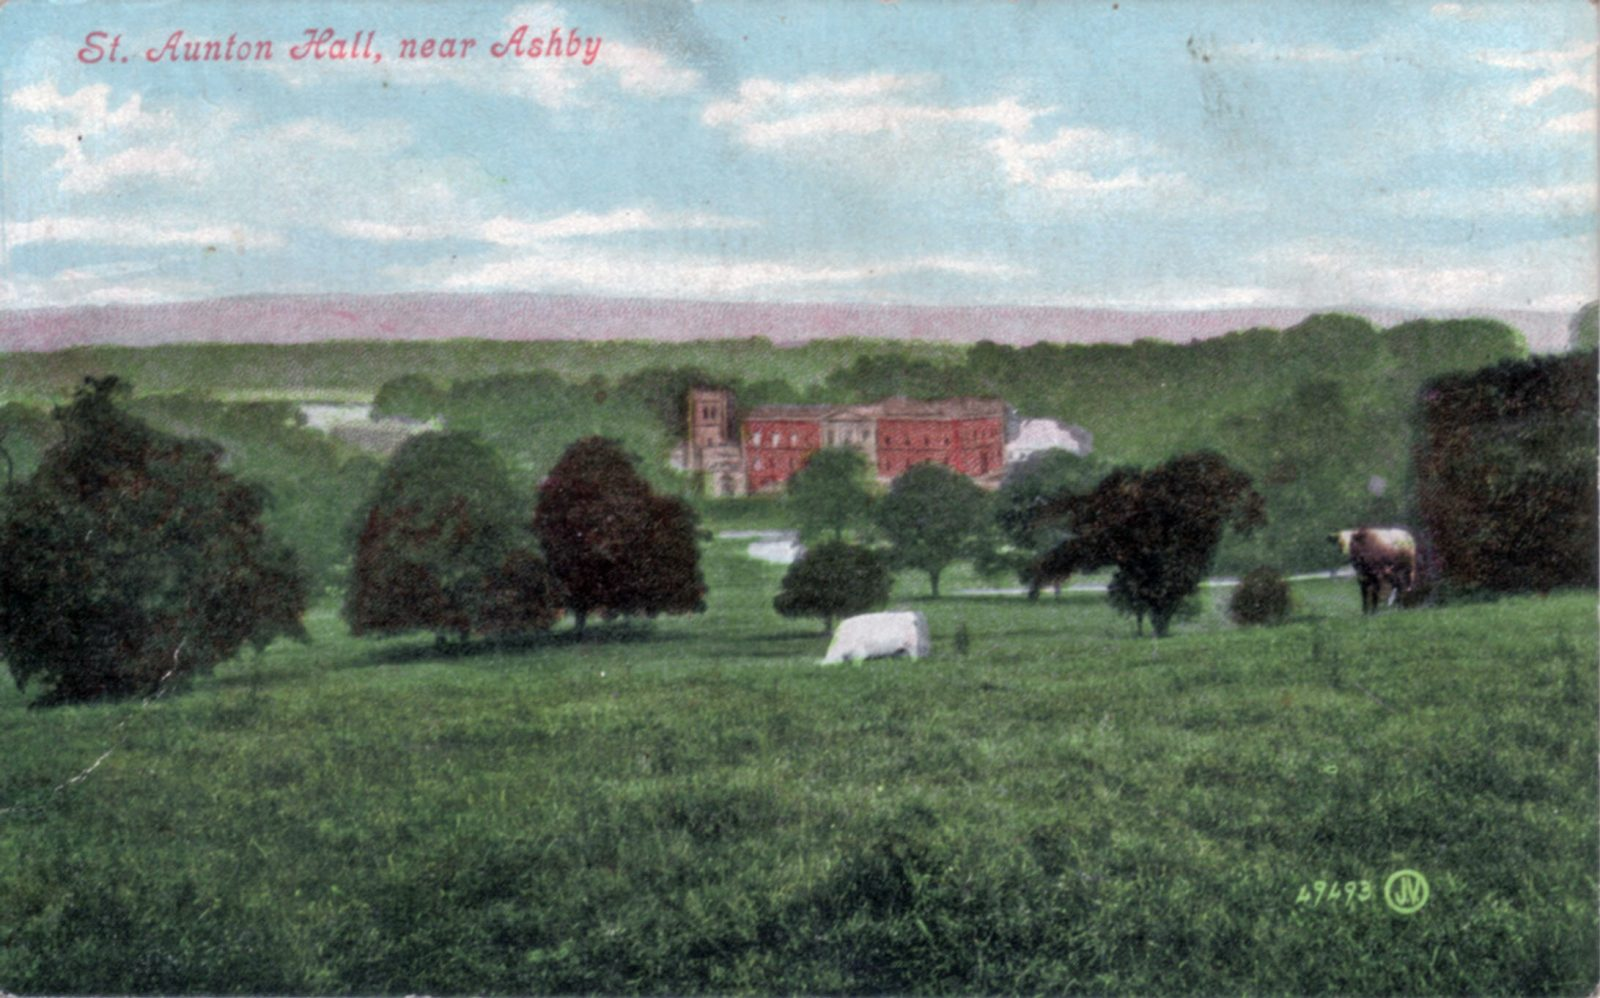 Staunton Harold, Ashby-De-La-Zouch. 1901-1920: View of Hall across parkland. Labelled St. Aunton Hall! (File:1330)